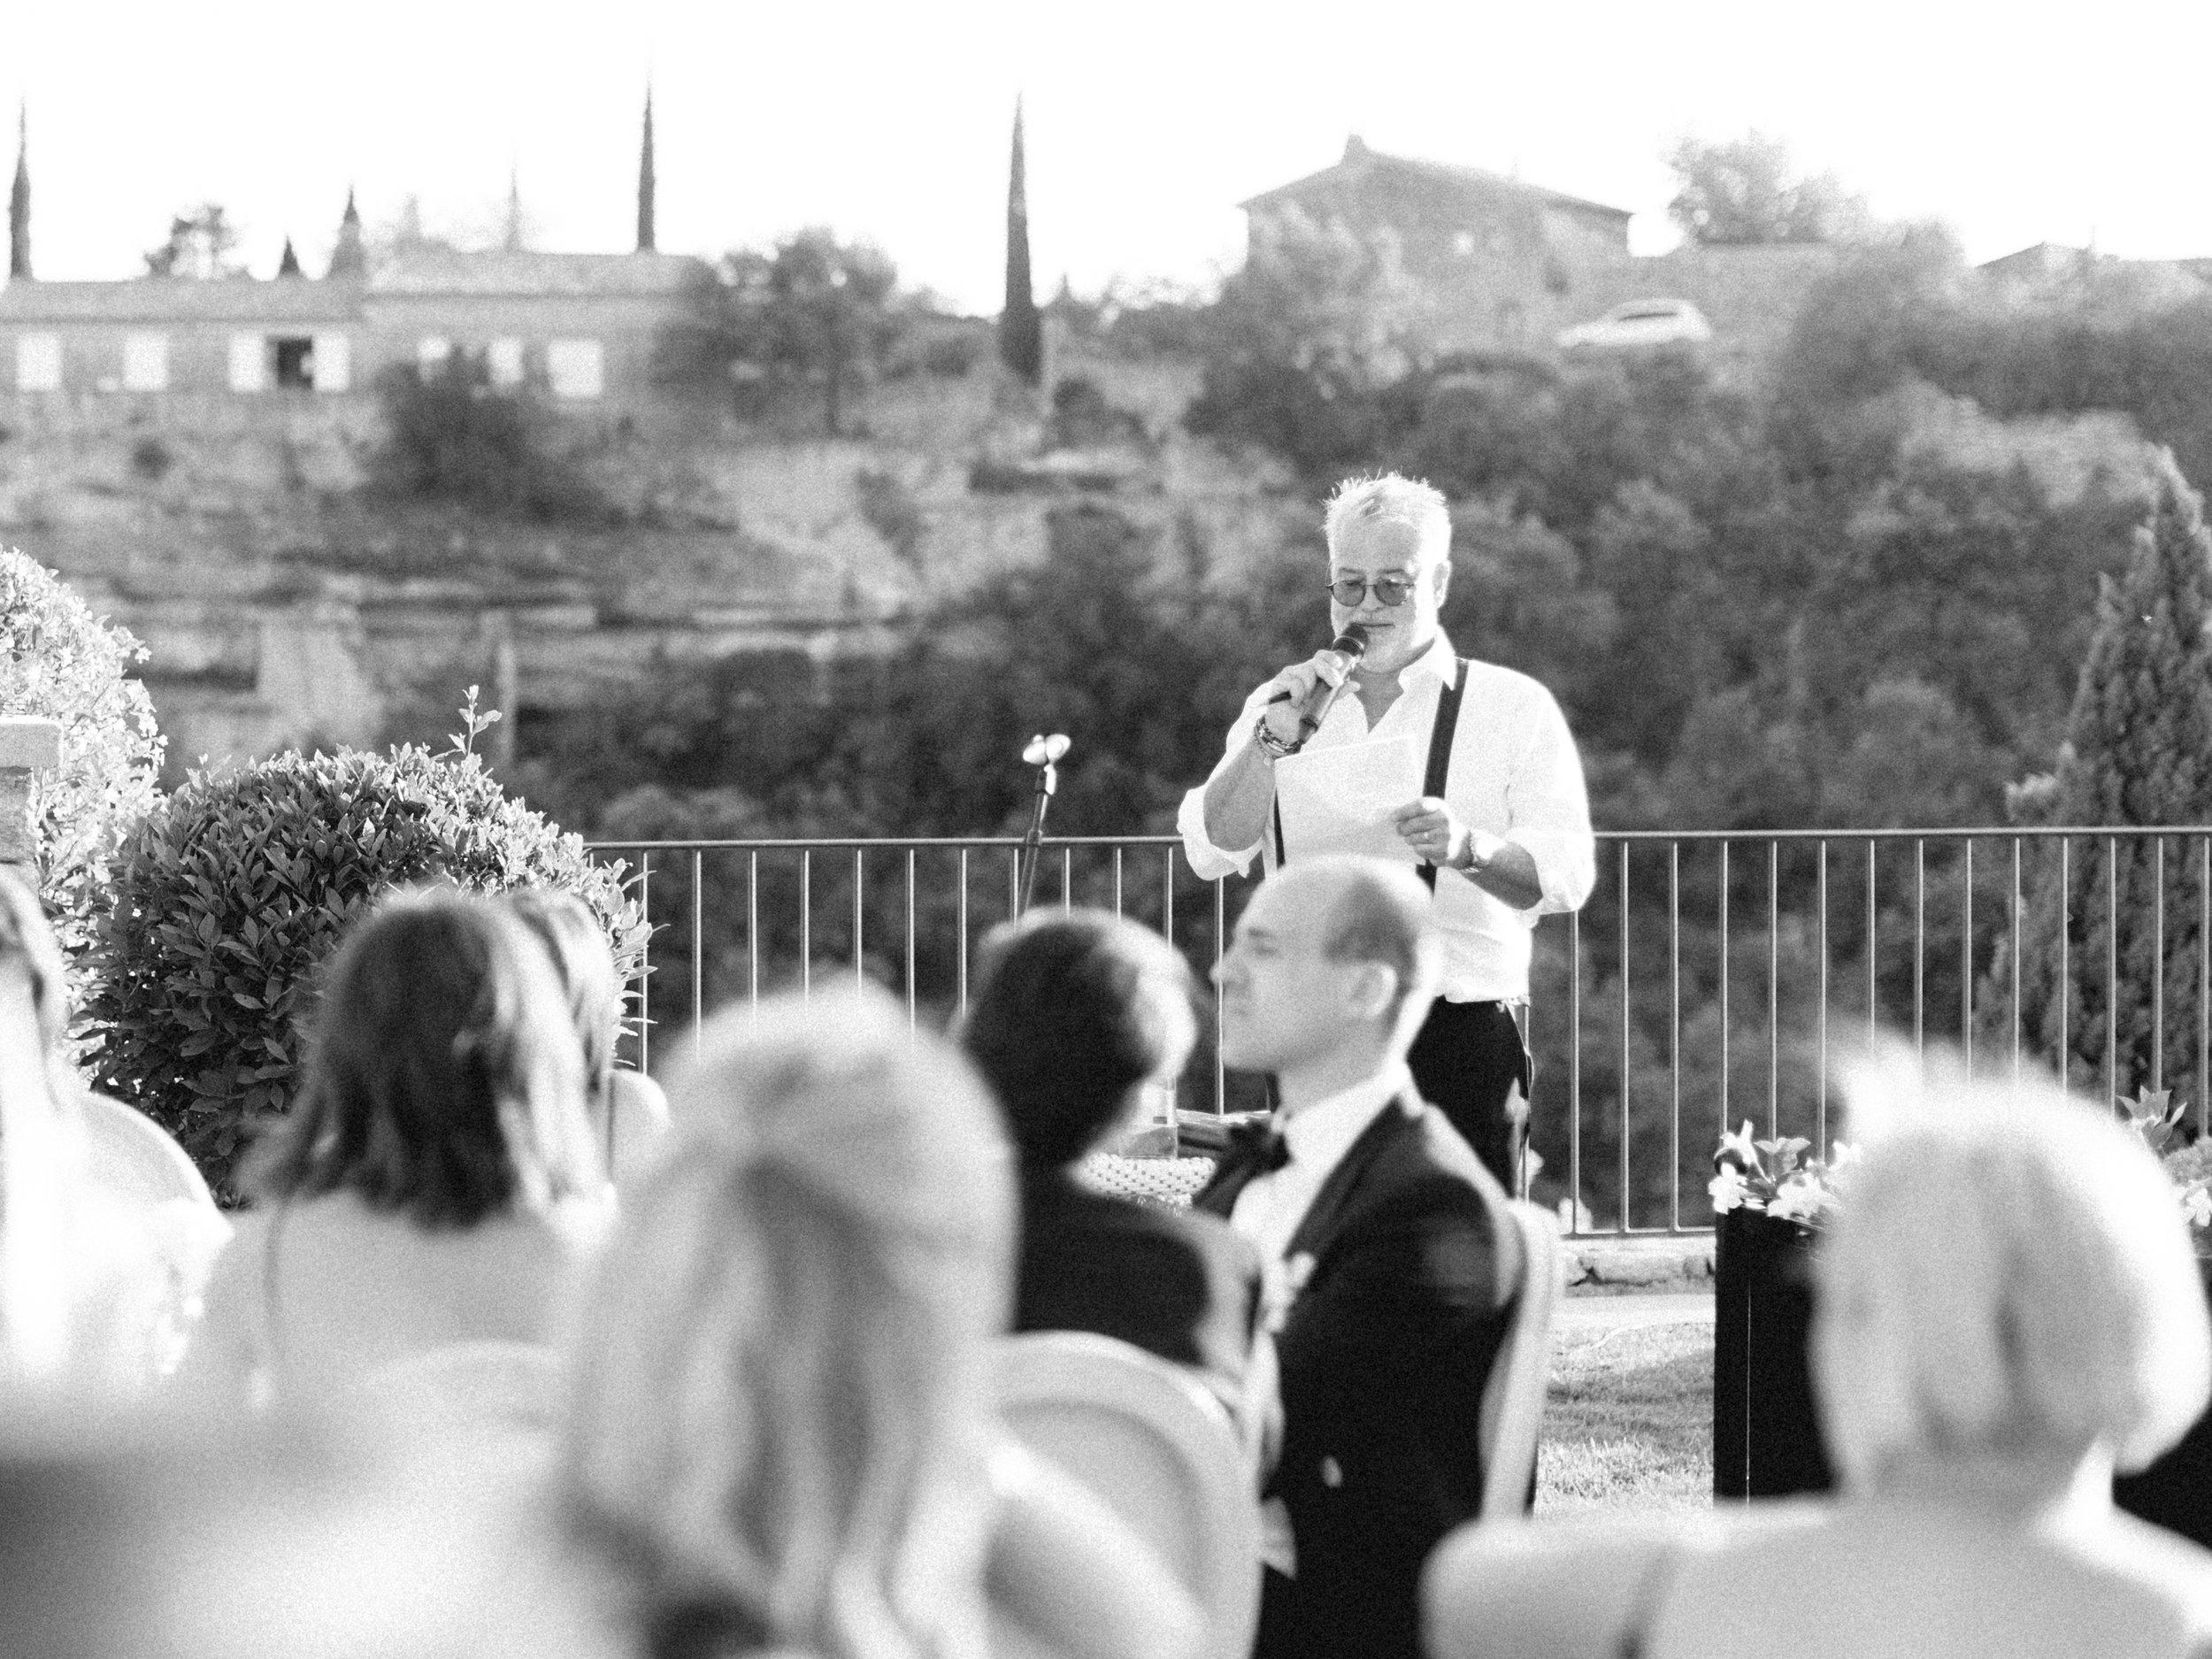 bastide_de_gordes_provence_wedding_(c)_rory-wylie-56.jpg